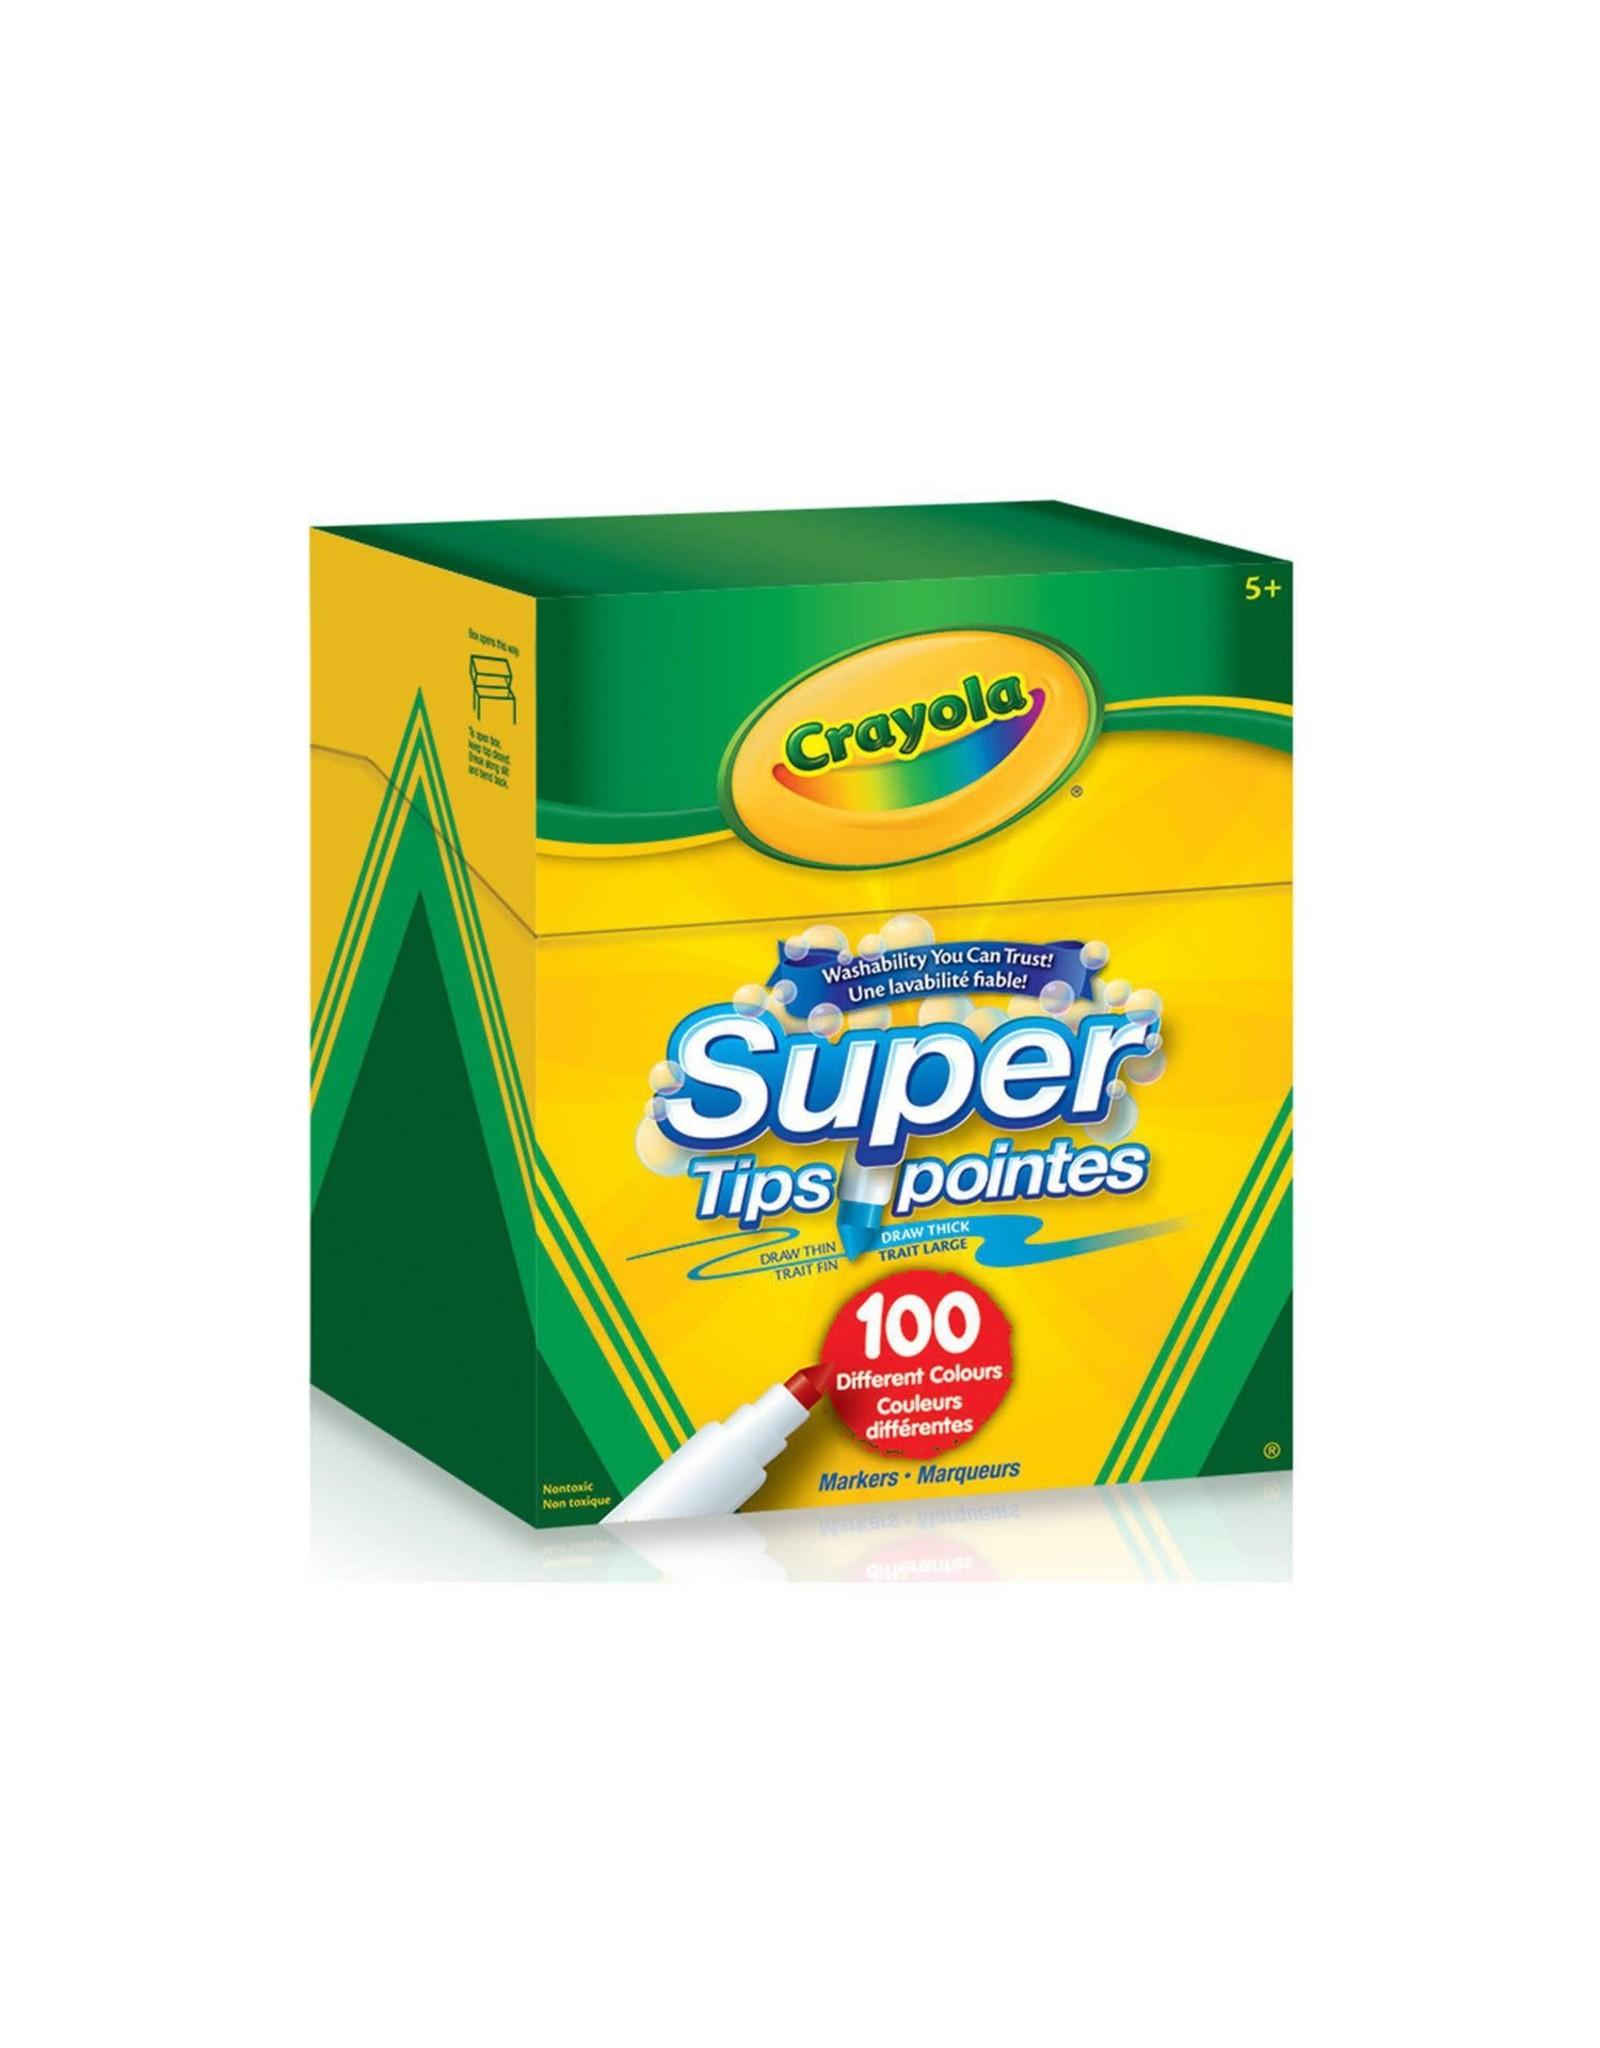 Crayola Super Tips Washable Markers - 100ct